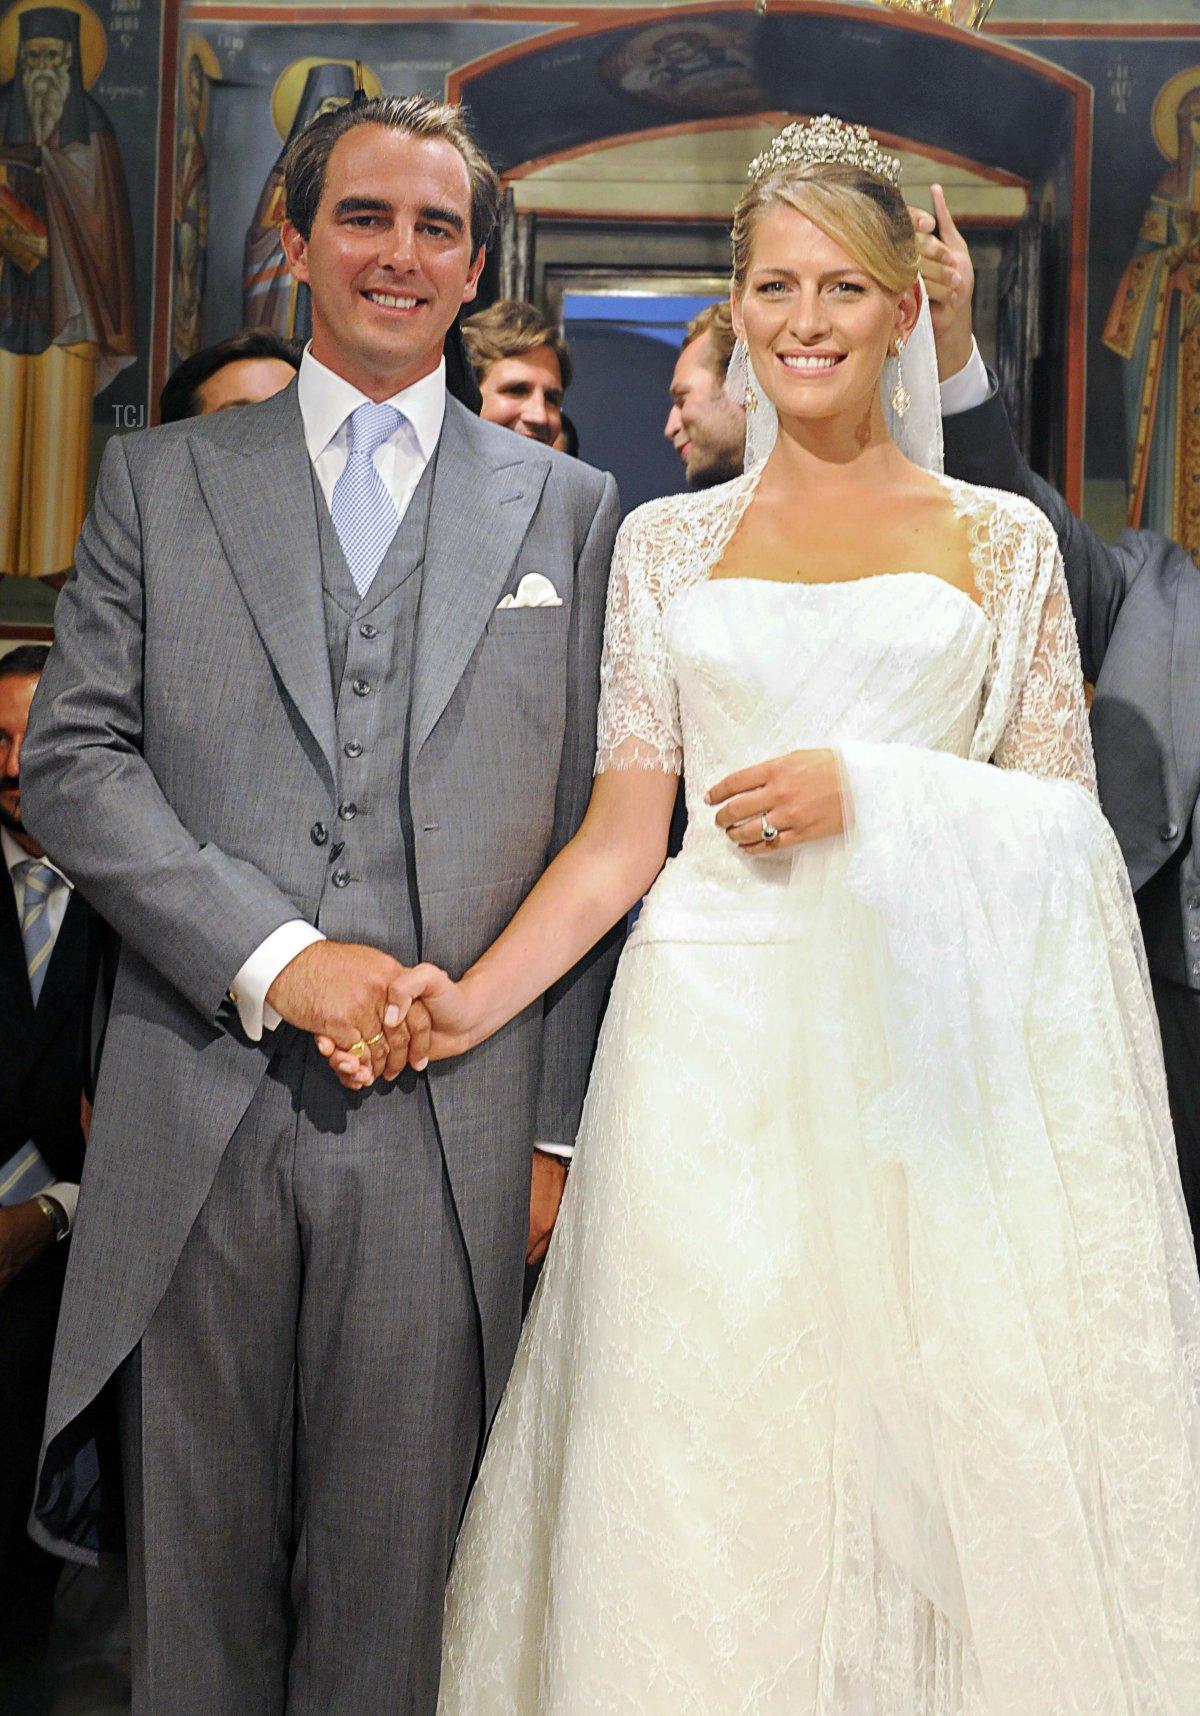 Prince Nikolaos of Greece and Tatiana Blatnik pose during their wedding ceremony in Saint Nicolas church at the island of Spetses on August 25, 2010